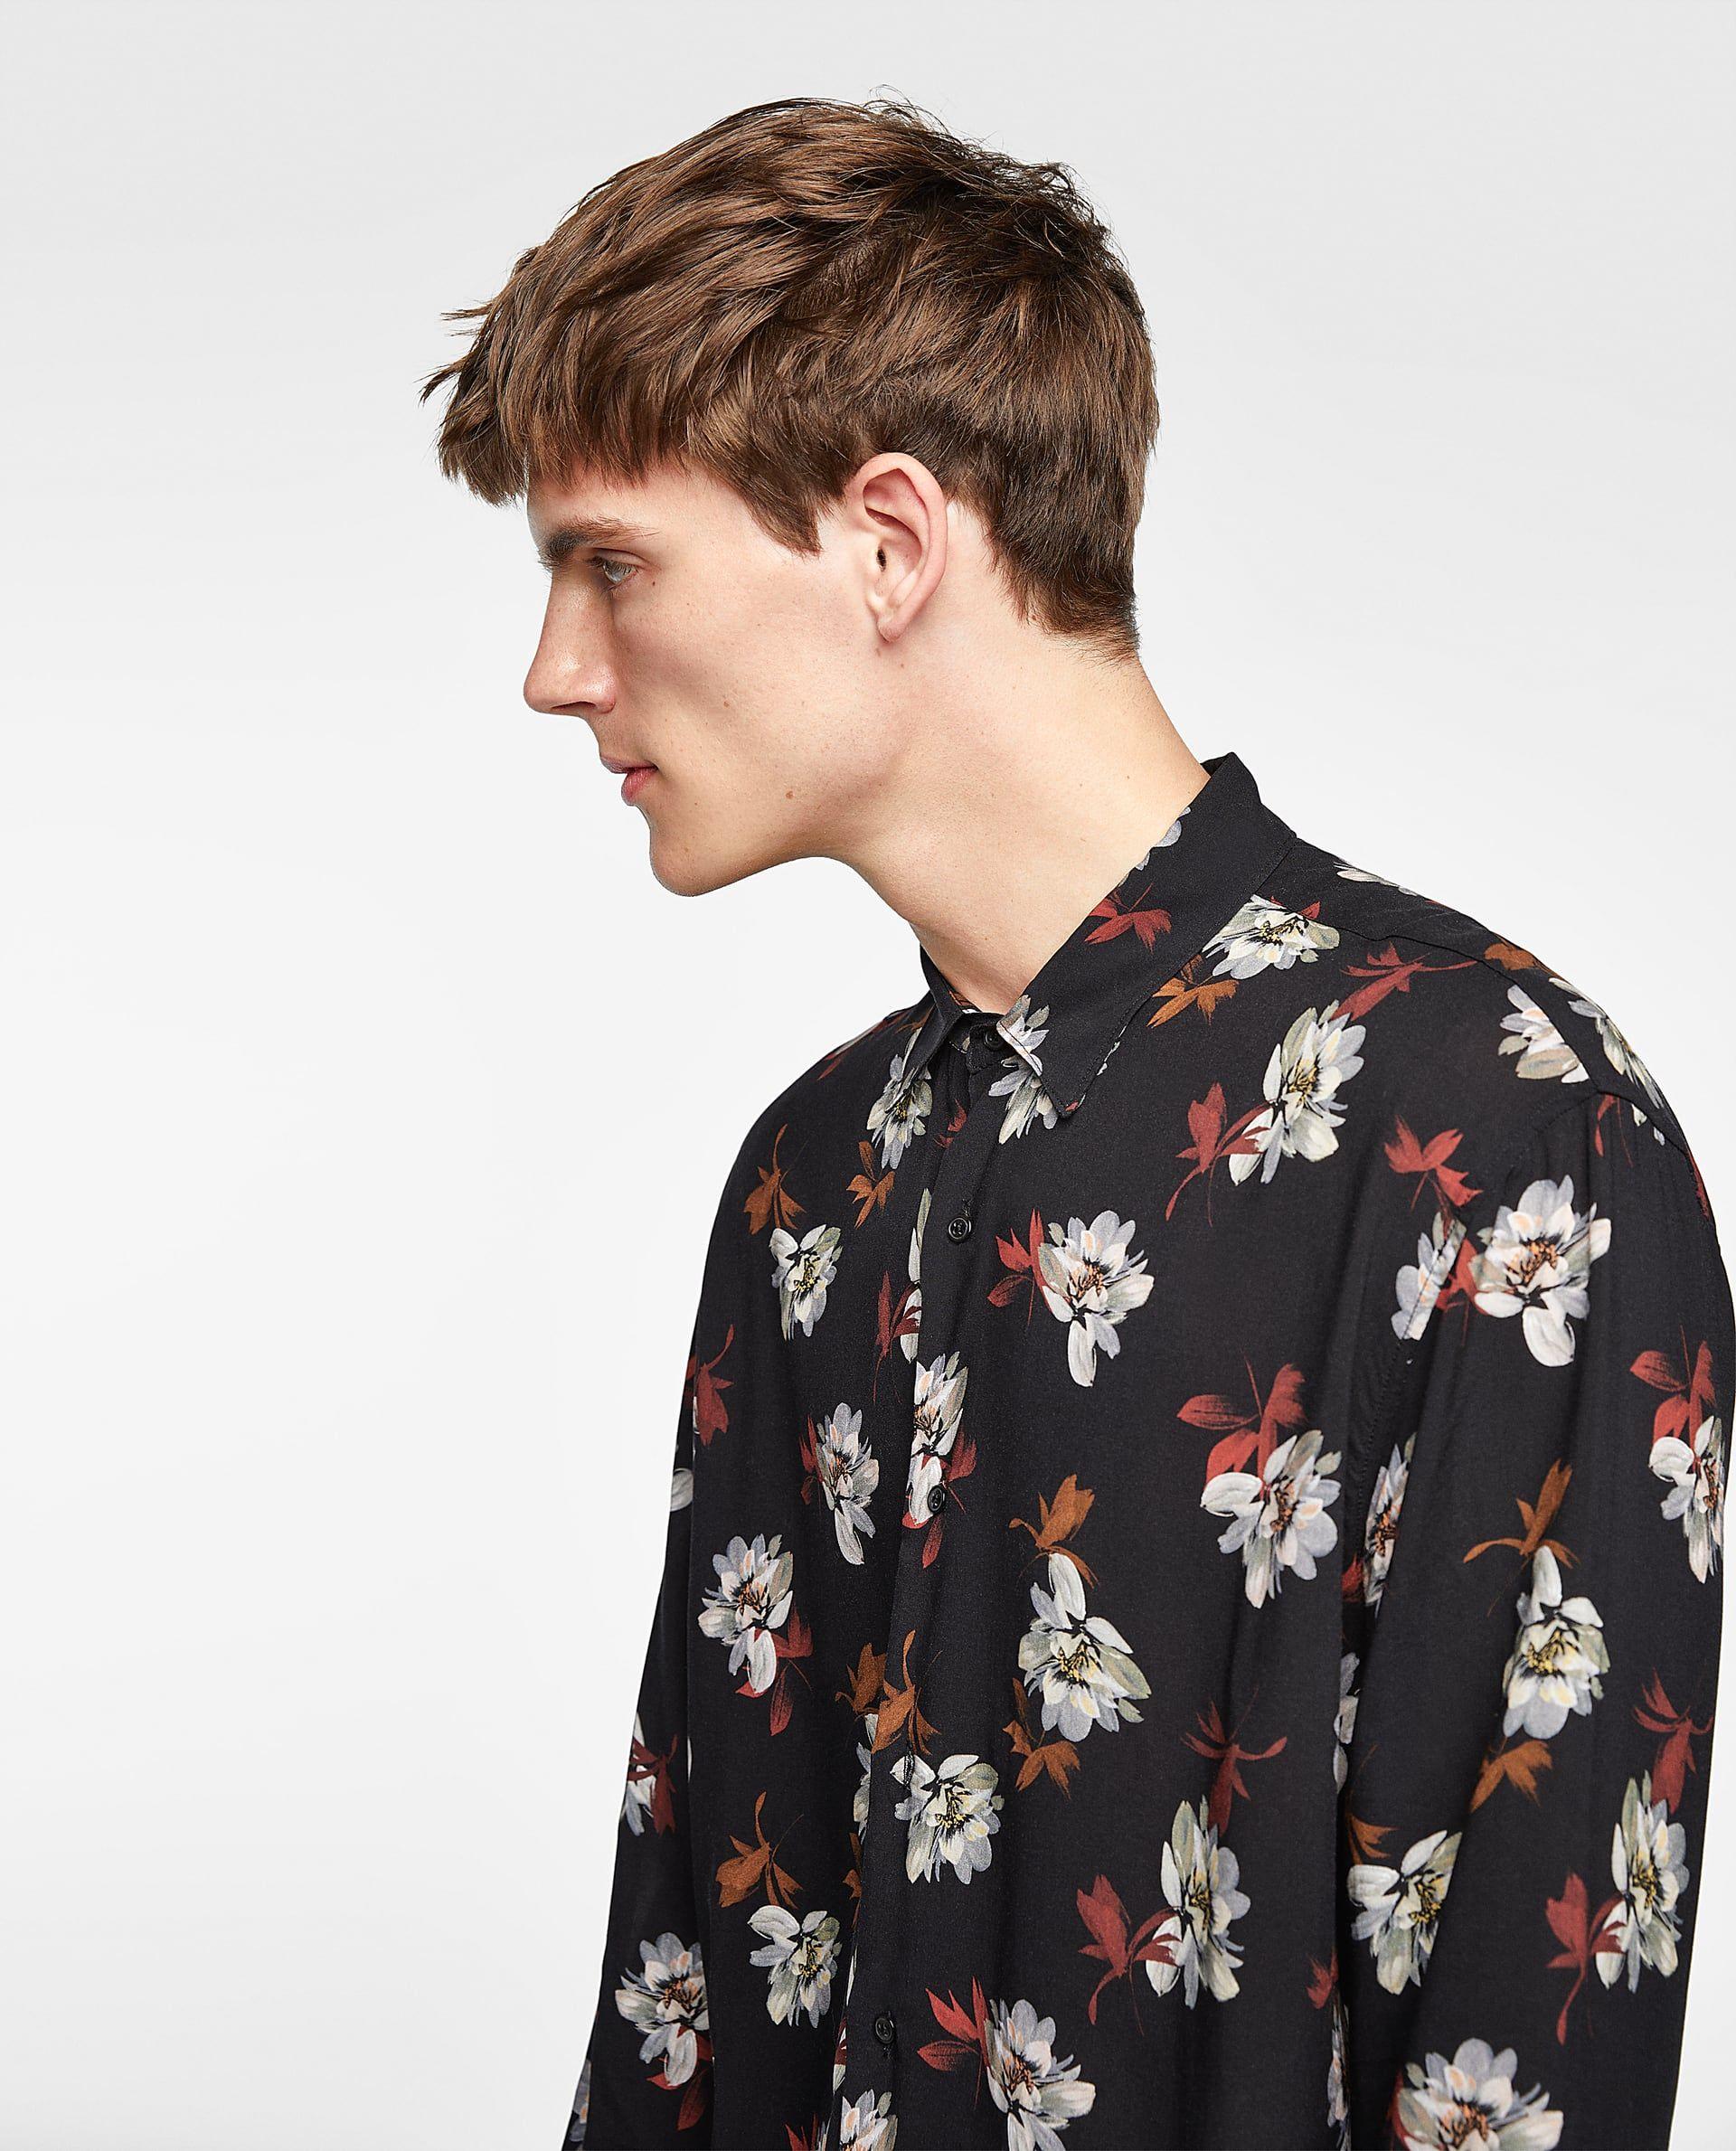 España Camisas para Nueva Colección hombre Online ZARA Tqf1xHCwq 48f0c93da18